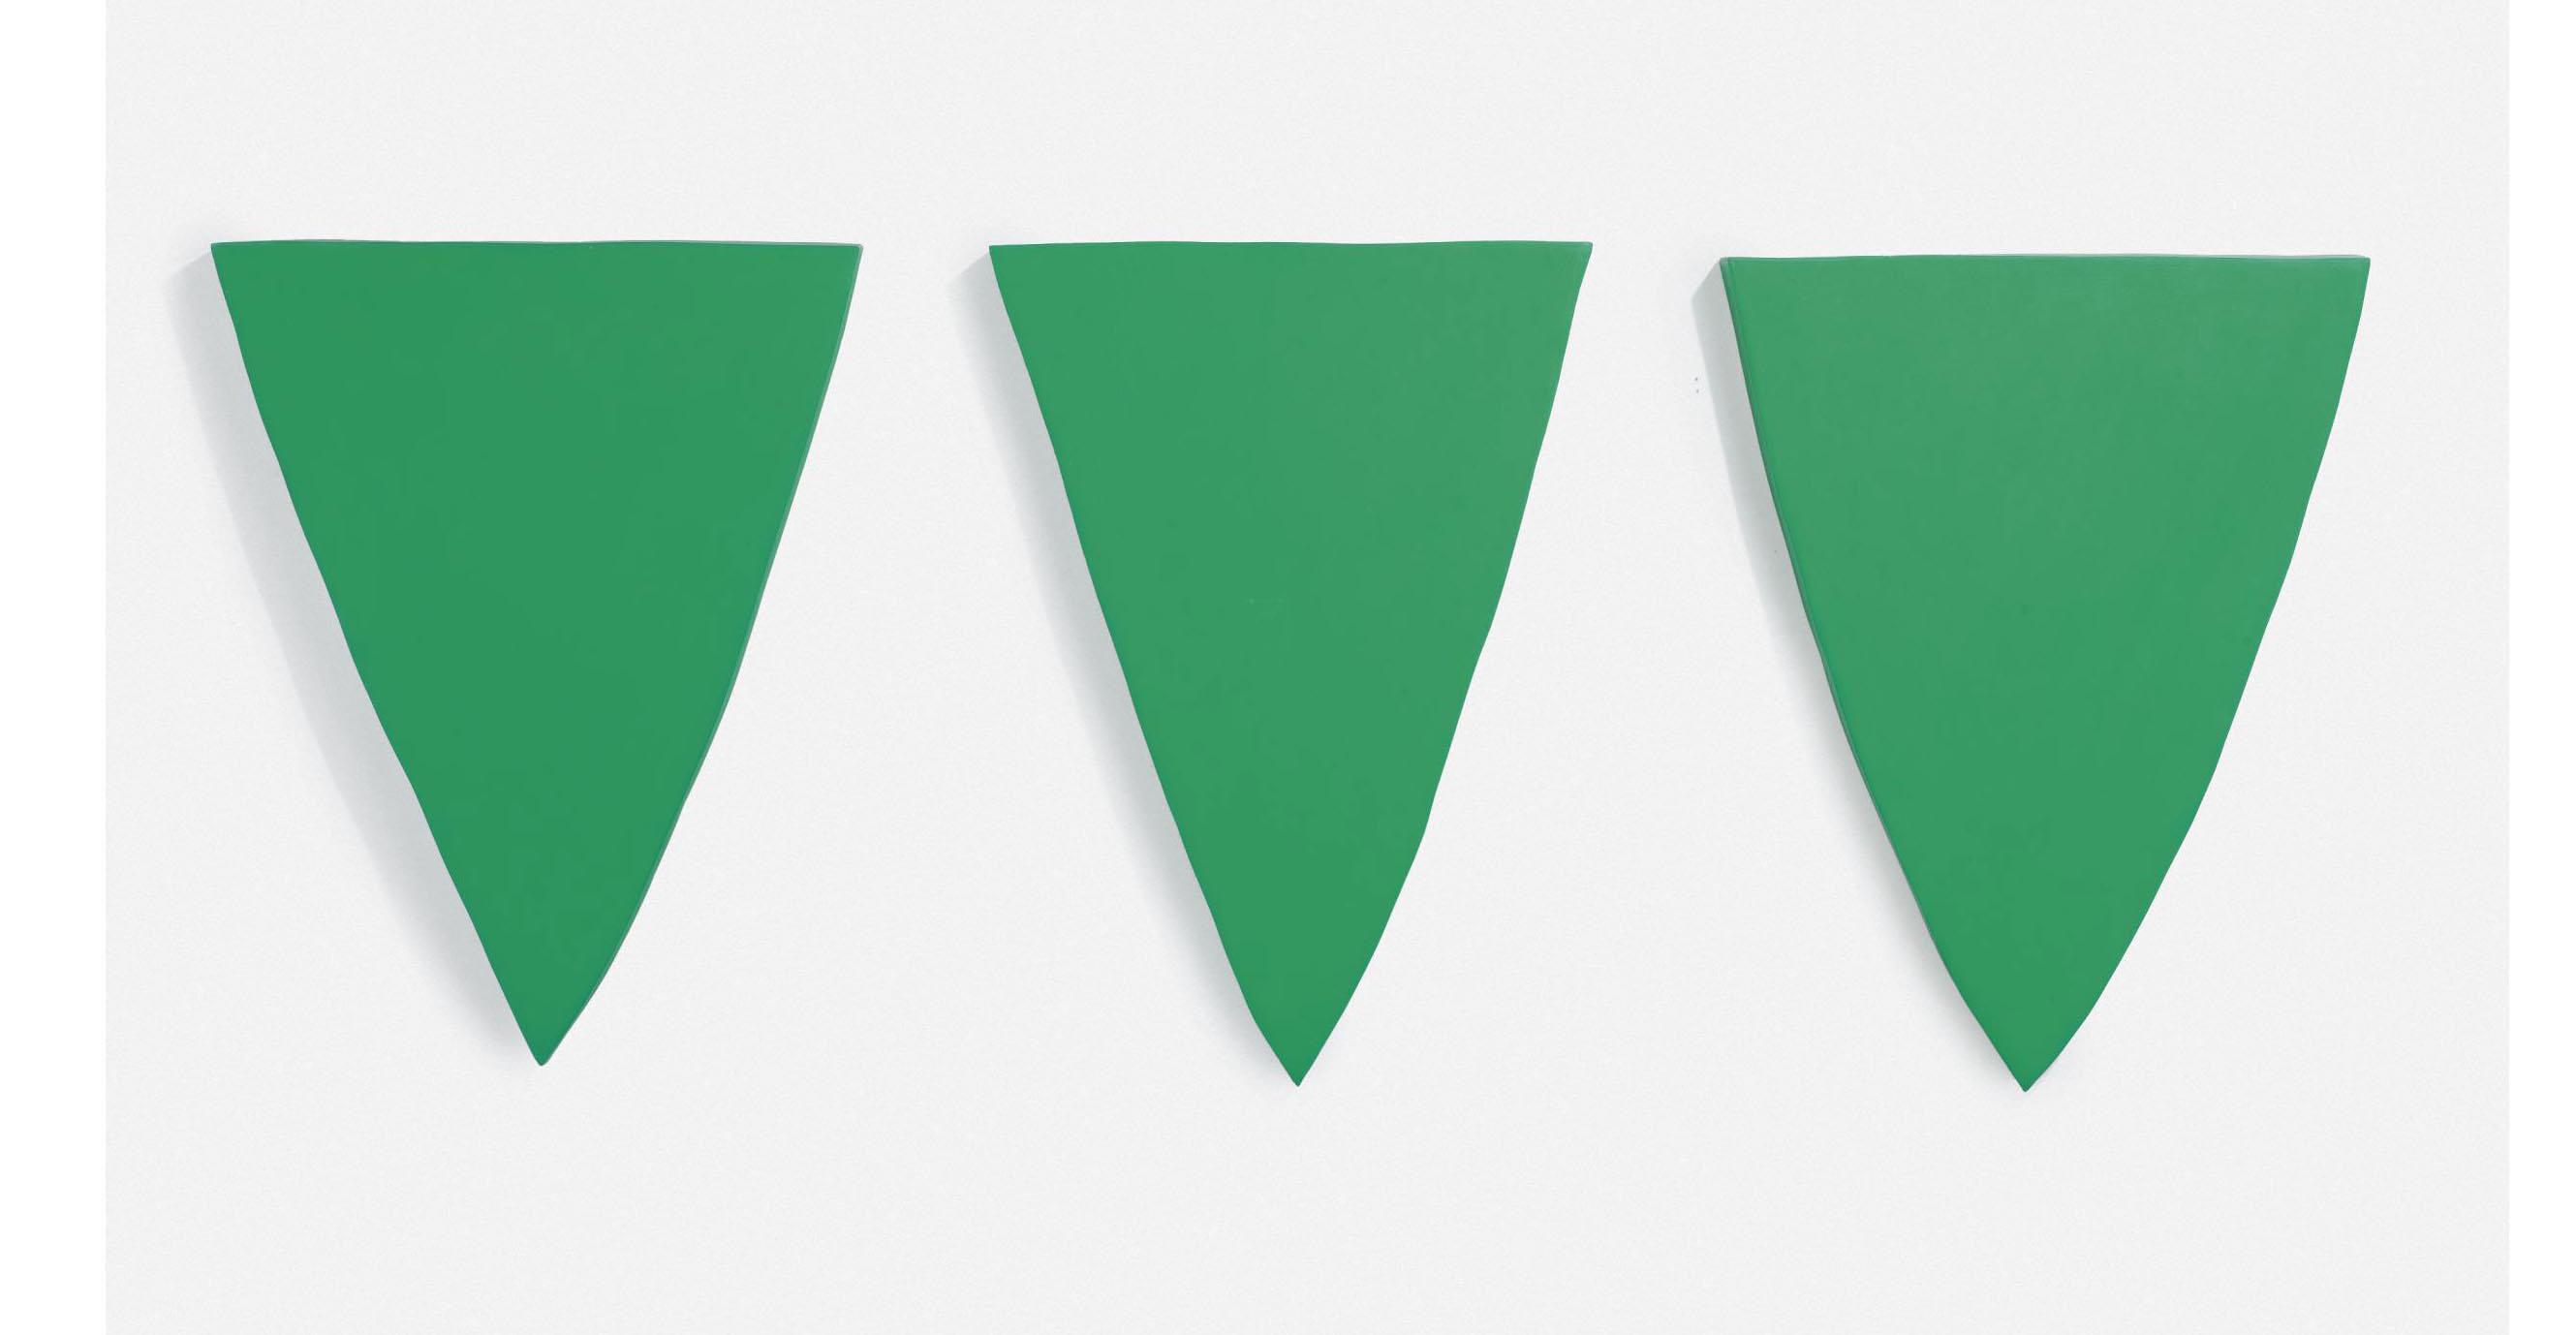 Green Triptych